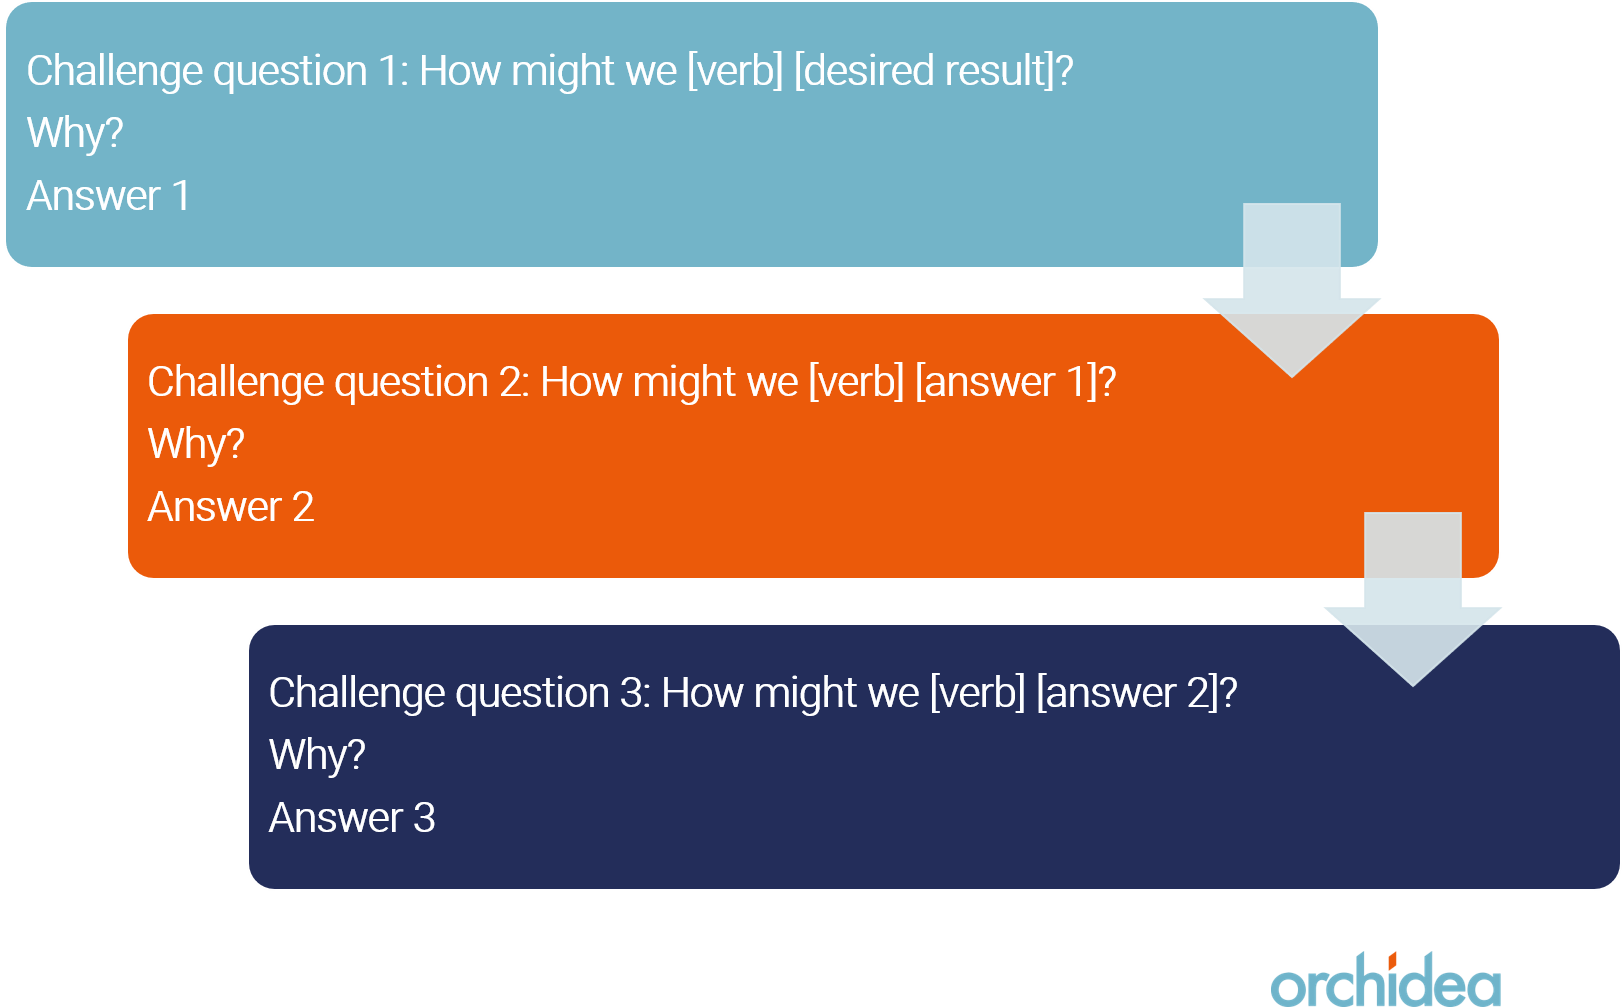 Developing challenge question alternatives